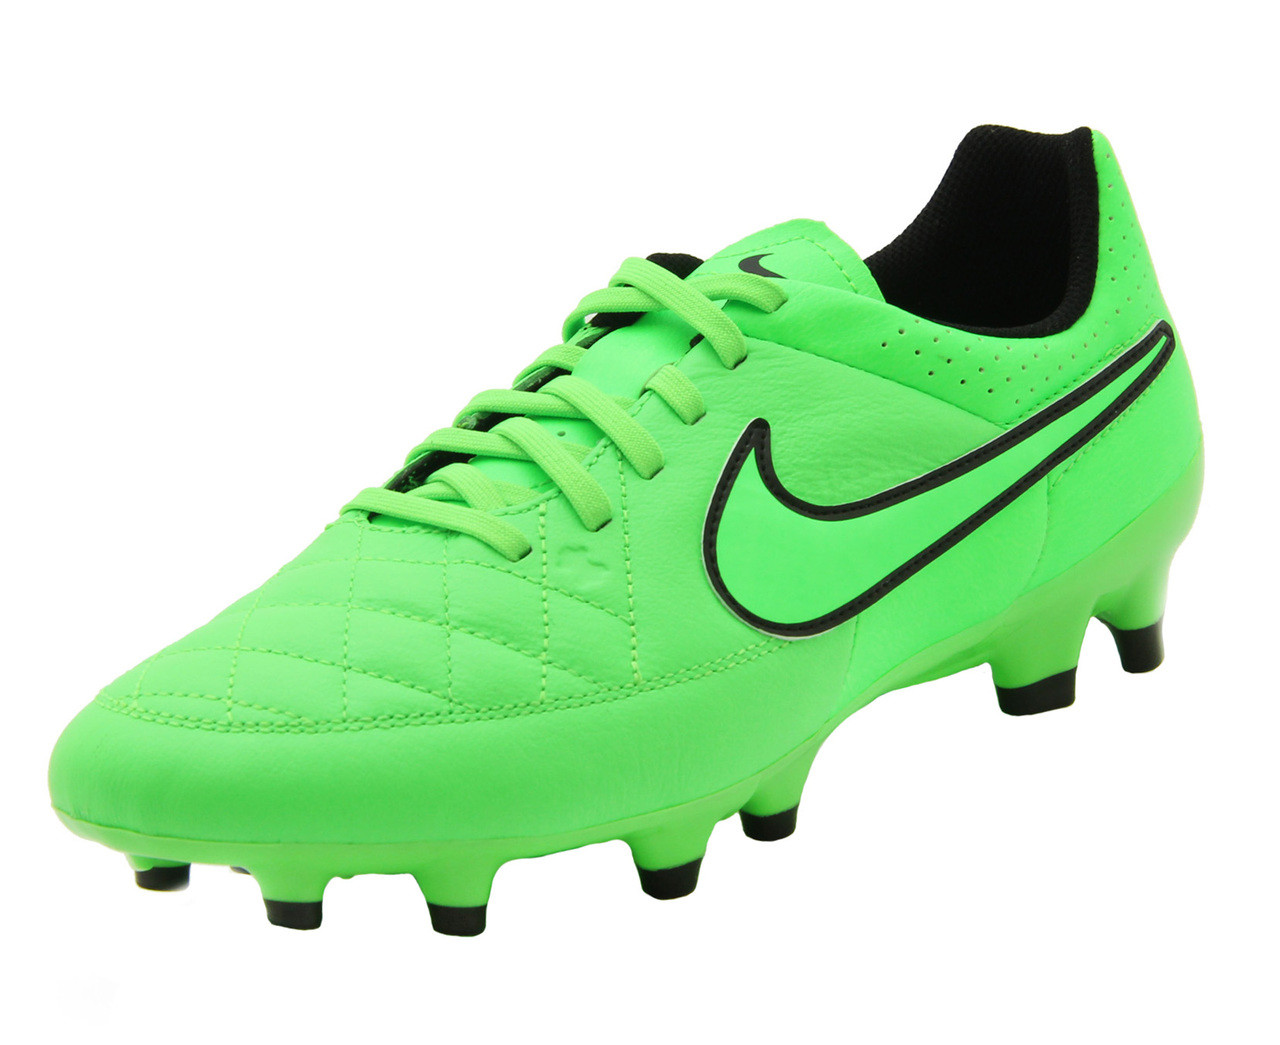 online retailer 46ffb 40d60 Nike Tiempo Genio Leather FG - Green Strike Black (61018) - ohp soccer